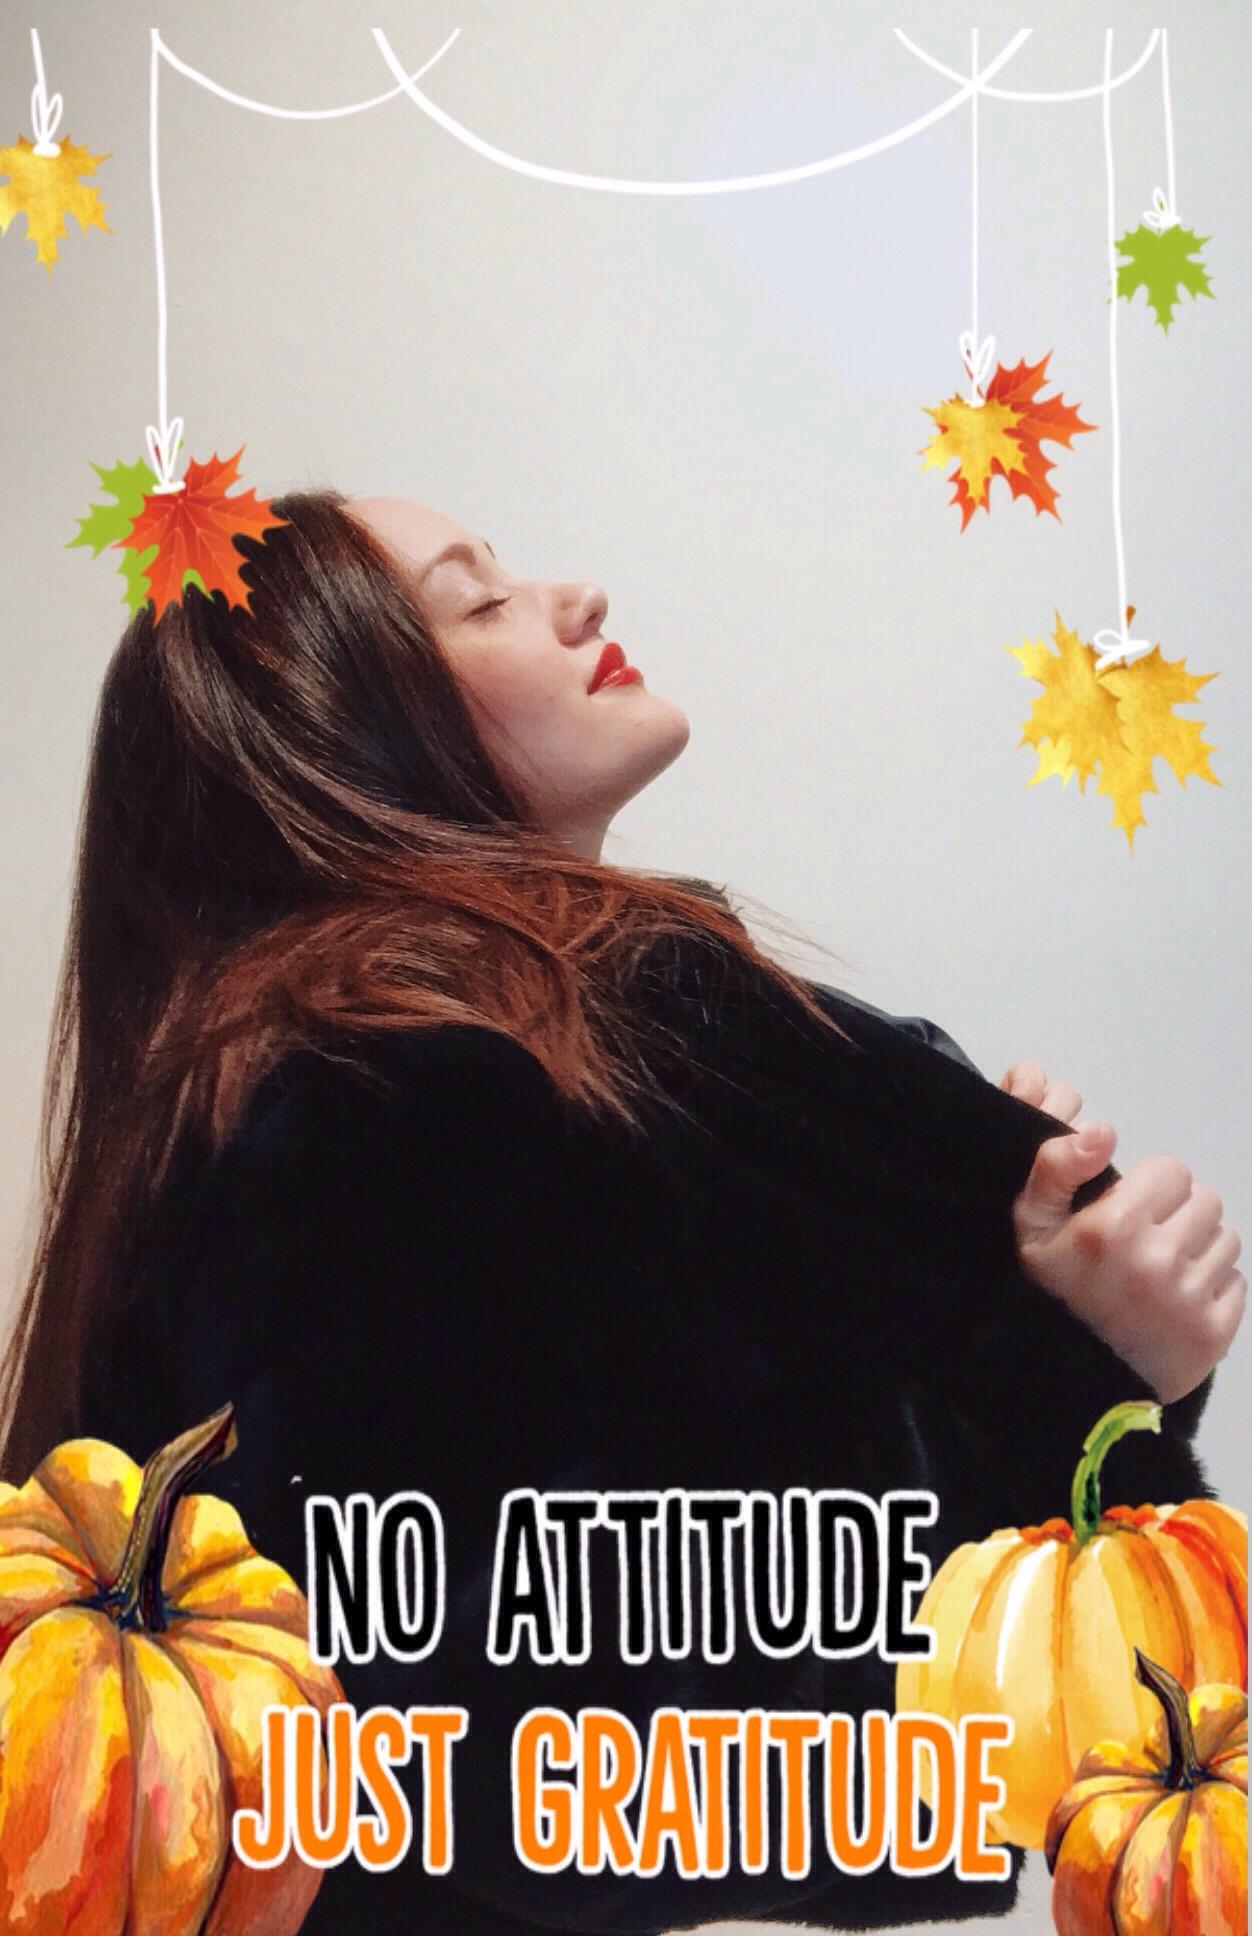 #freetoedit #thanksgiving #thankful #happythanksgiving